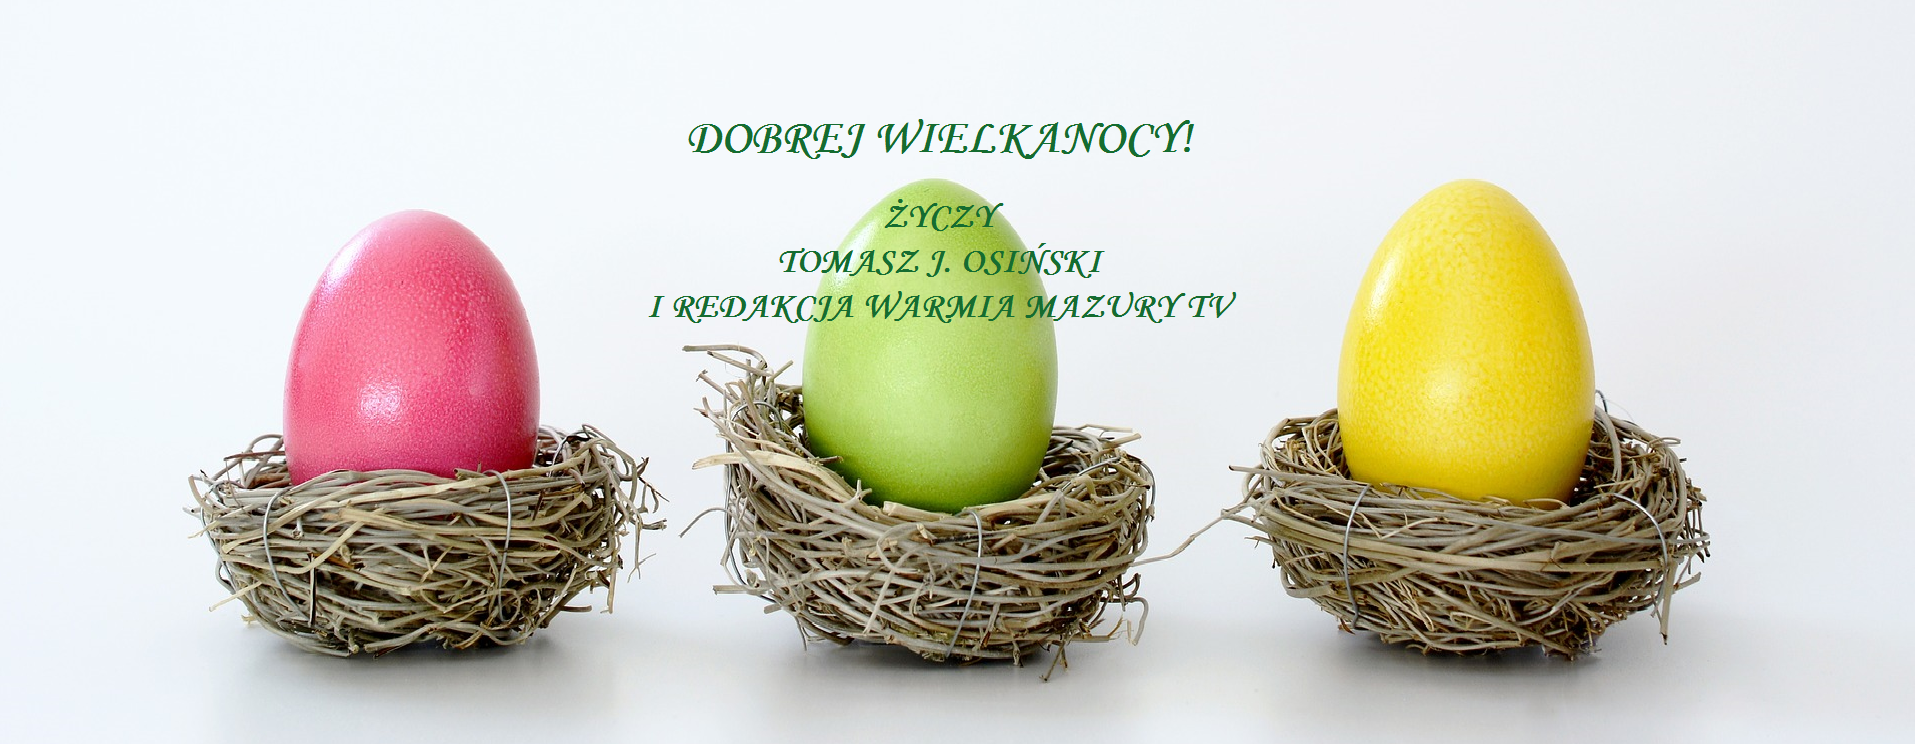 TOMEK_O_WIELKANOC